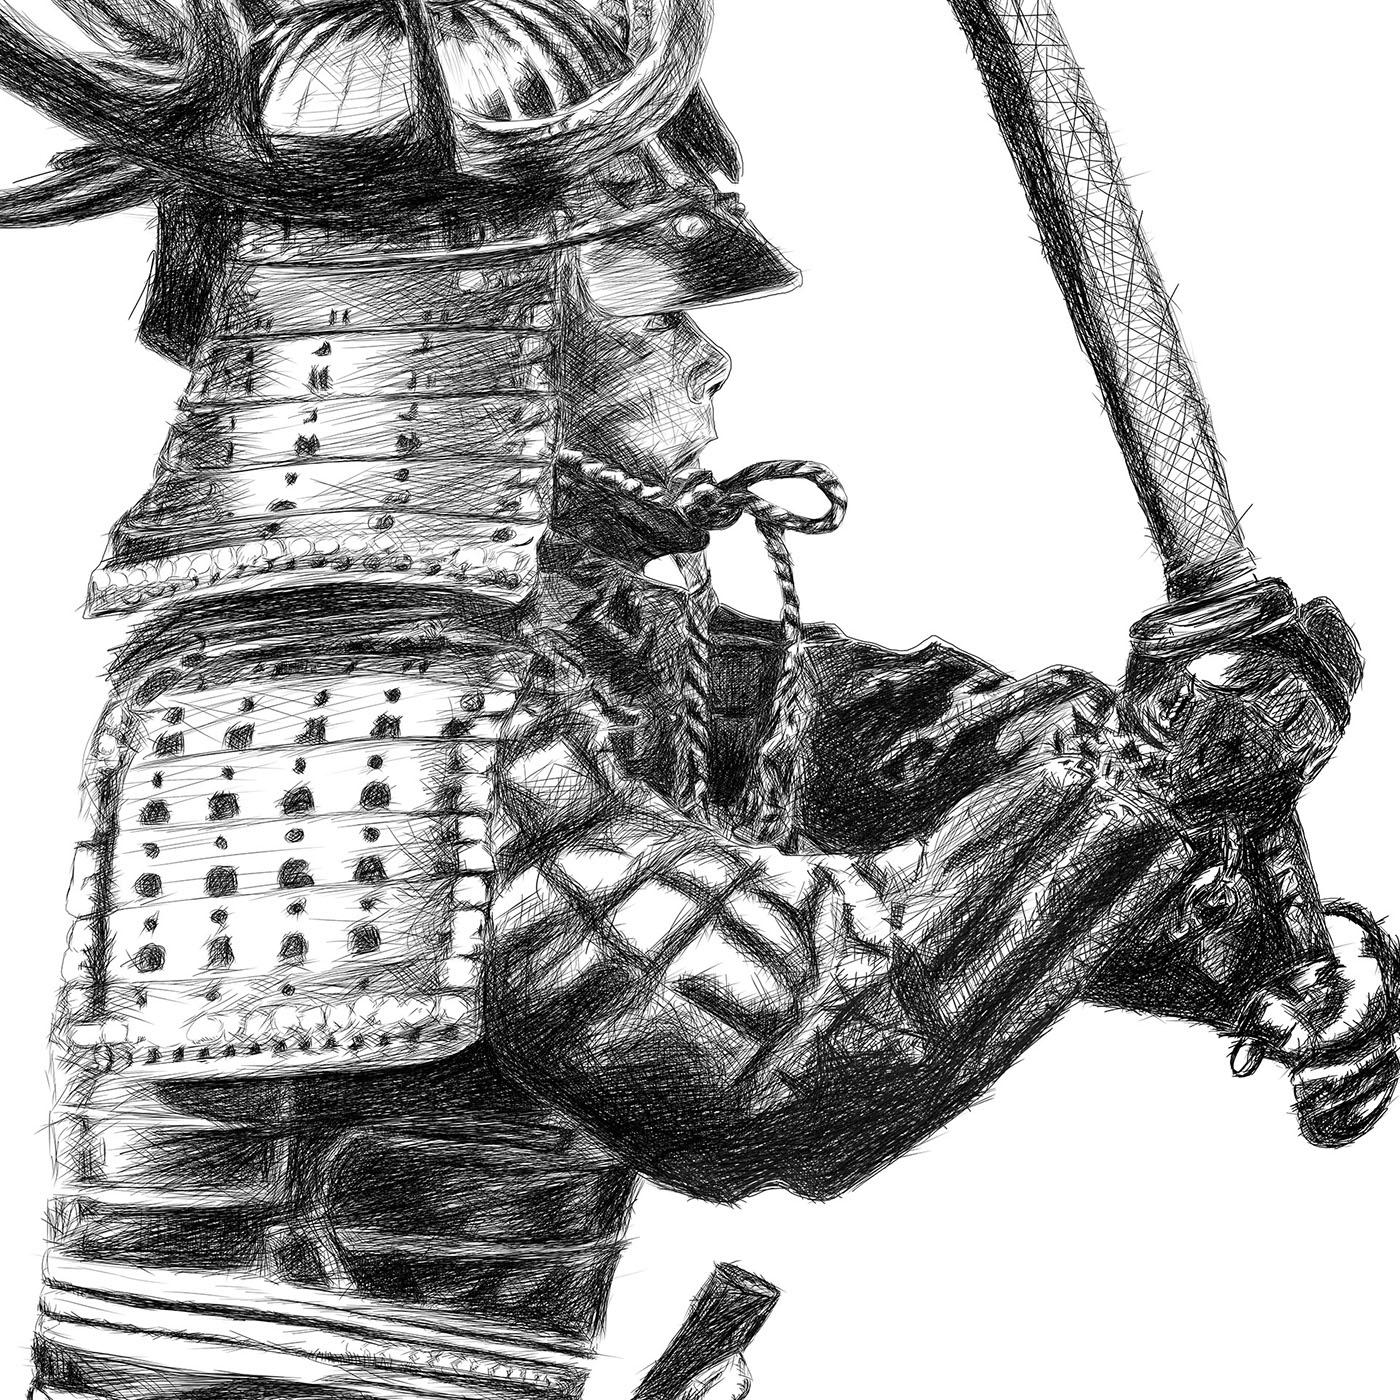 Samurai line drawing digital pencil ציור קווי סמוראי עיפרון דיגיטלי closeup1